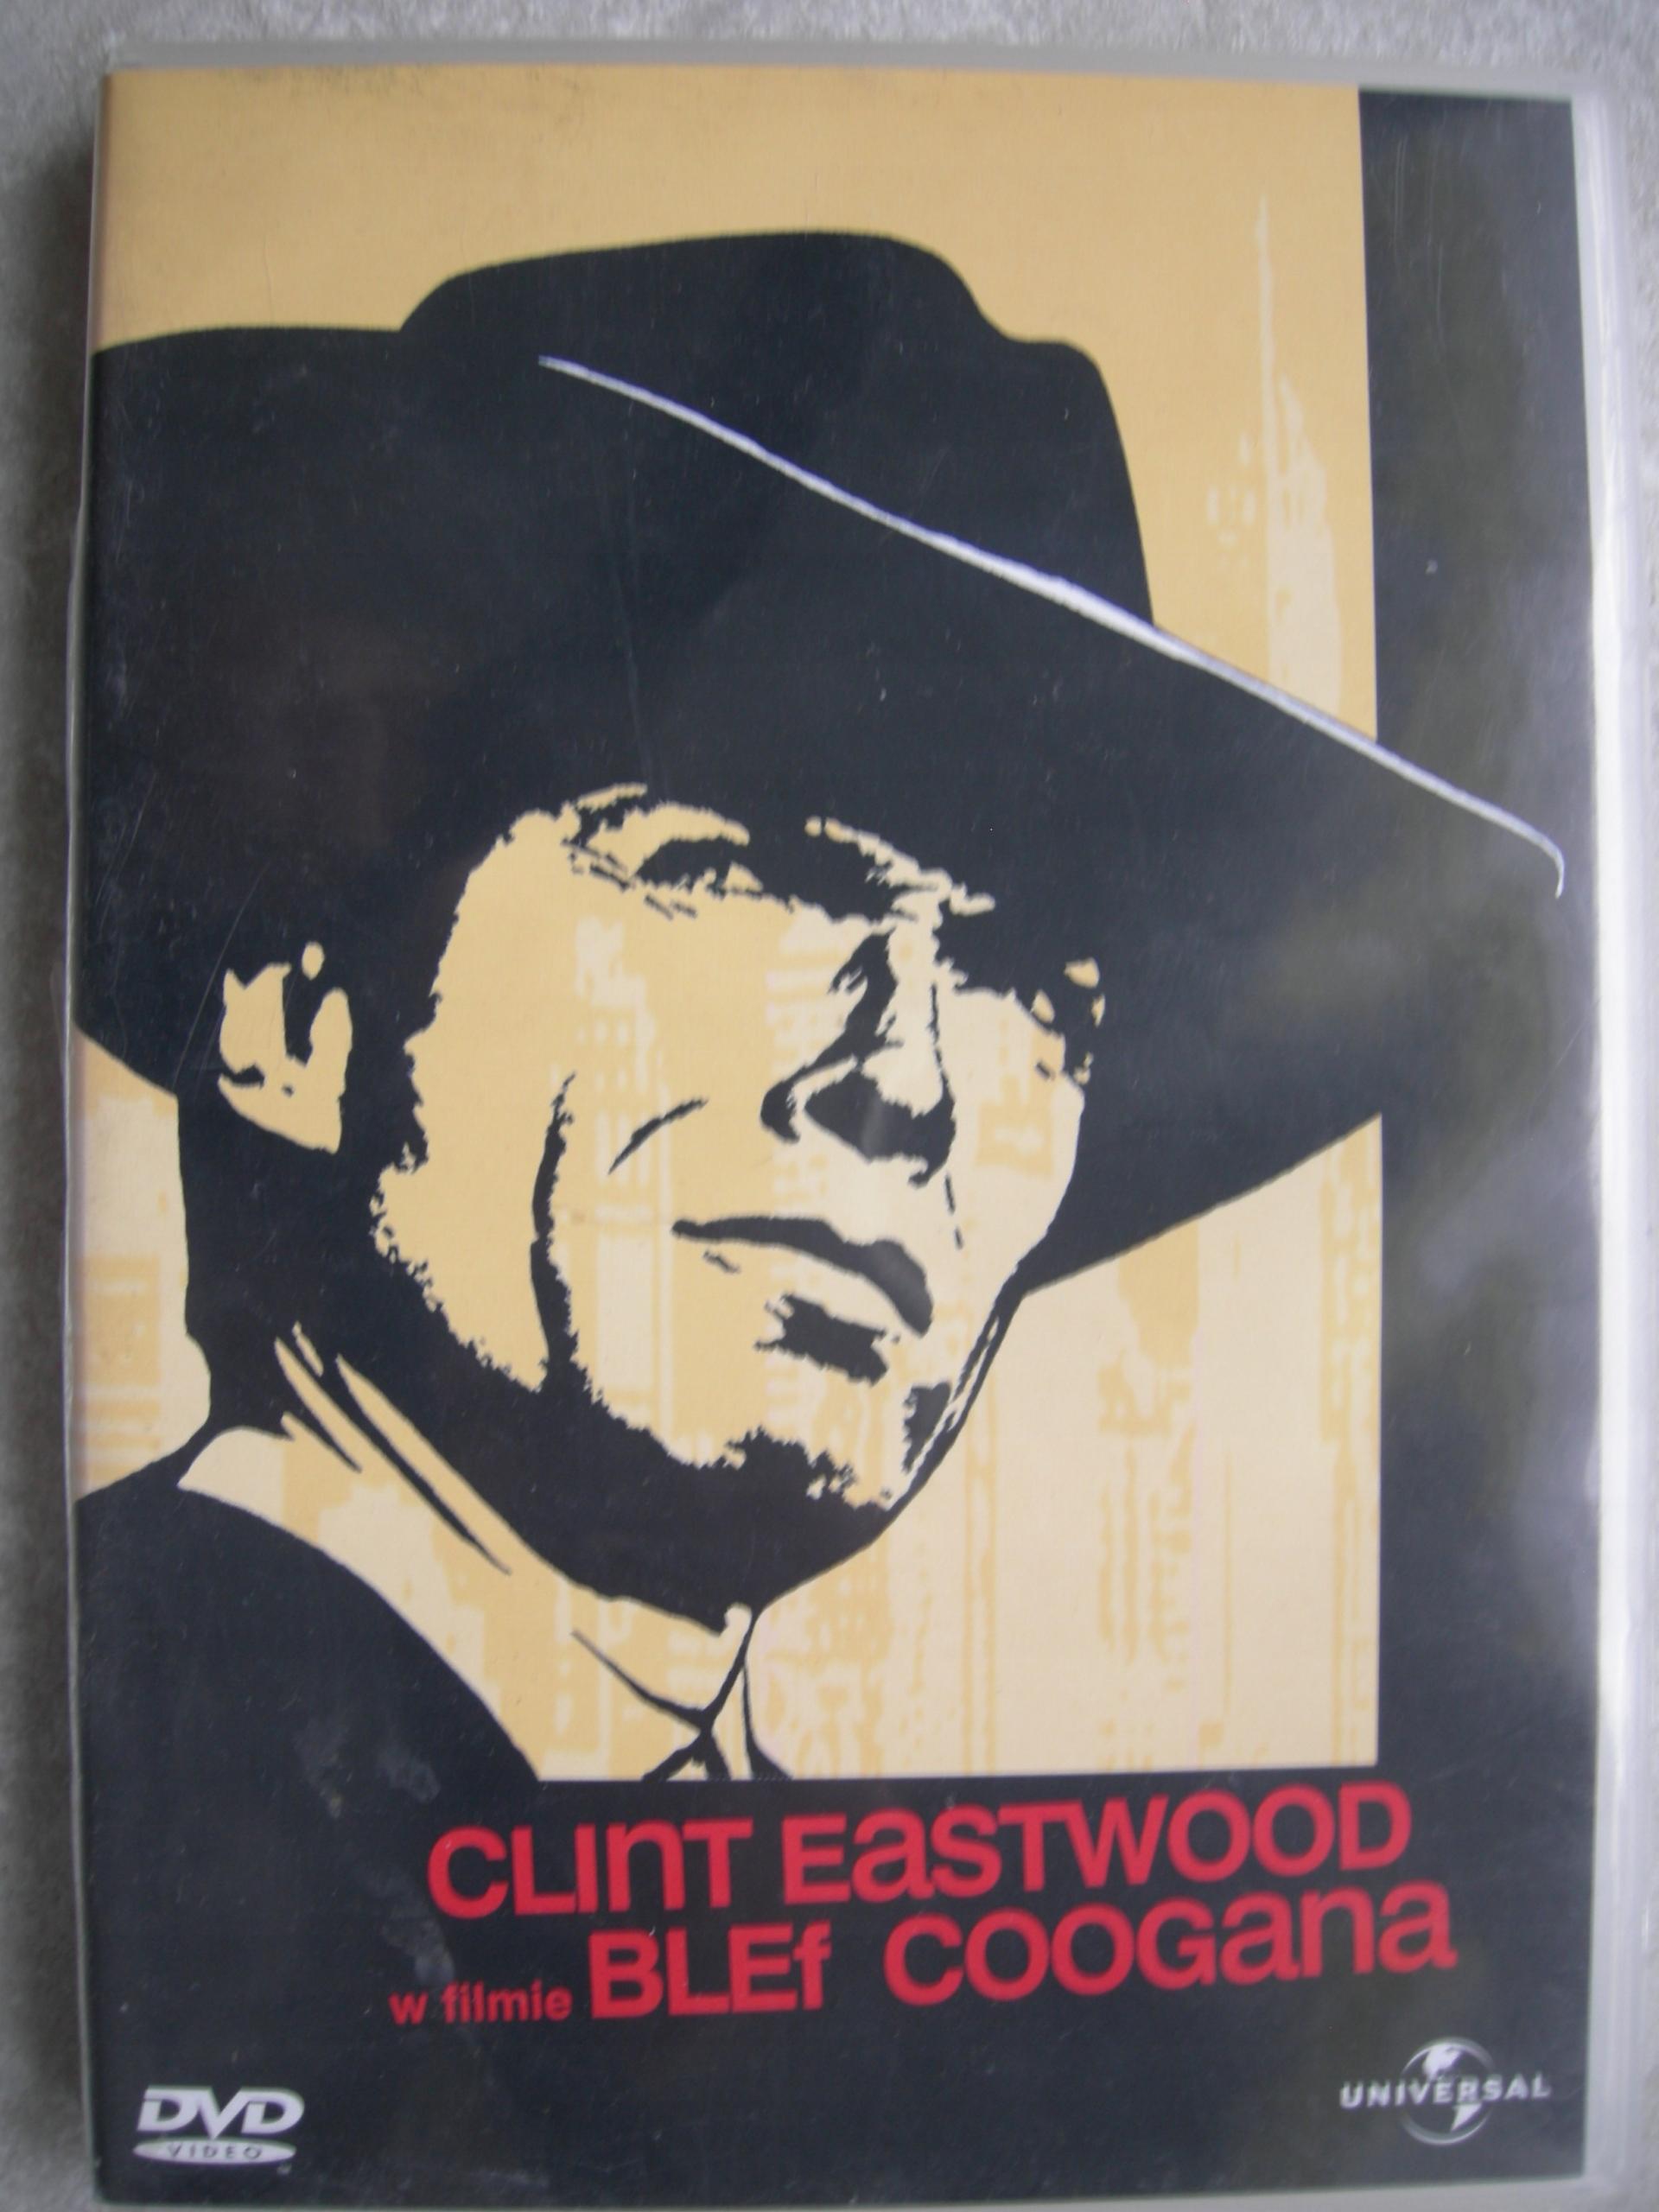 BLEF COOGANA EASTWOOD DVD. STAN BARDZO DOBRY -.